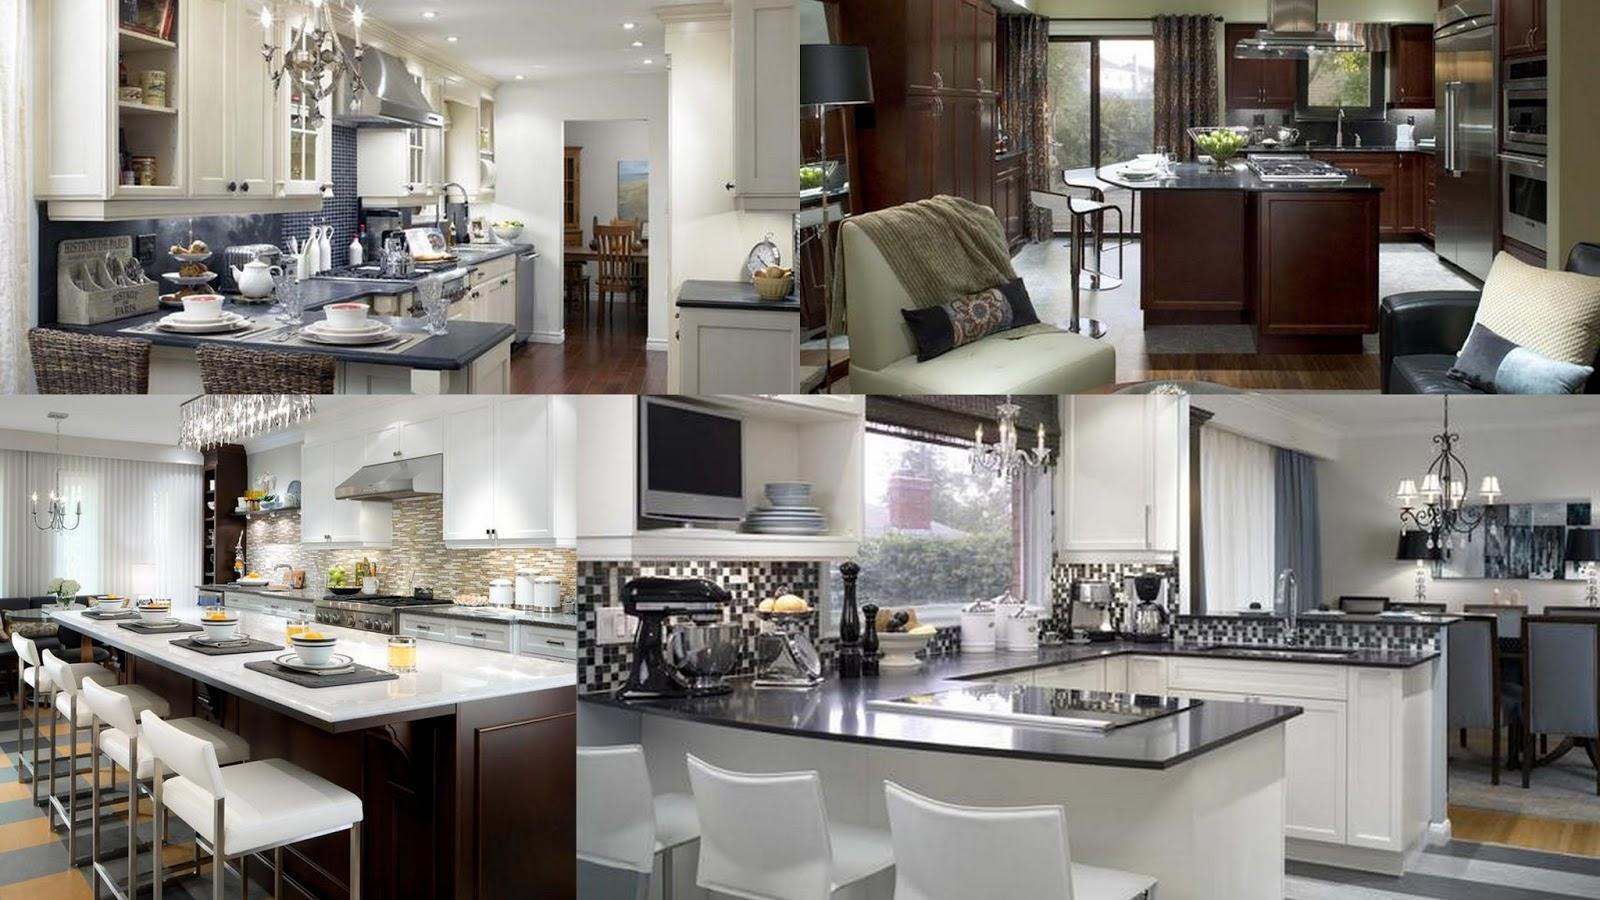 candice olson grey kitchen photo - 4